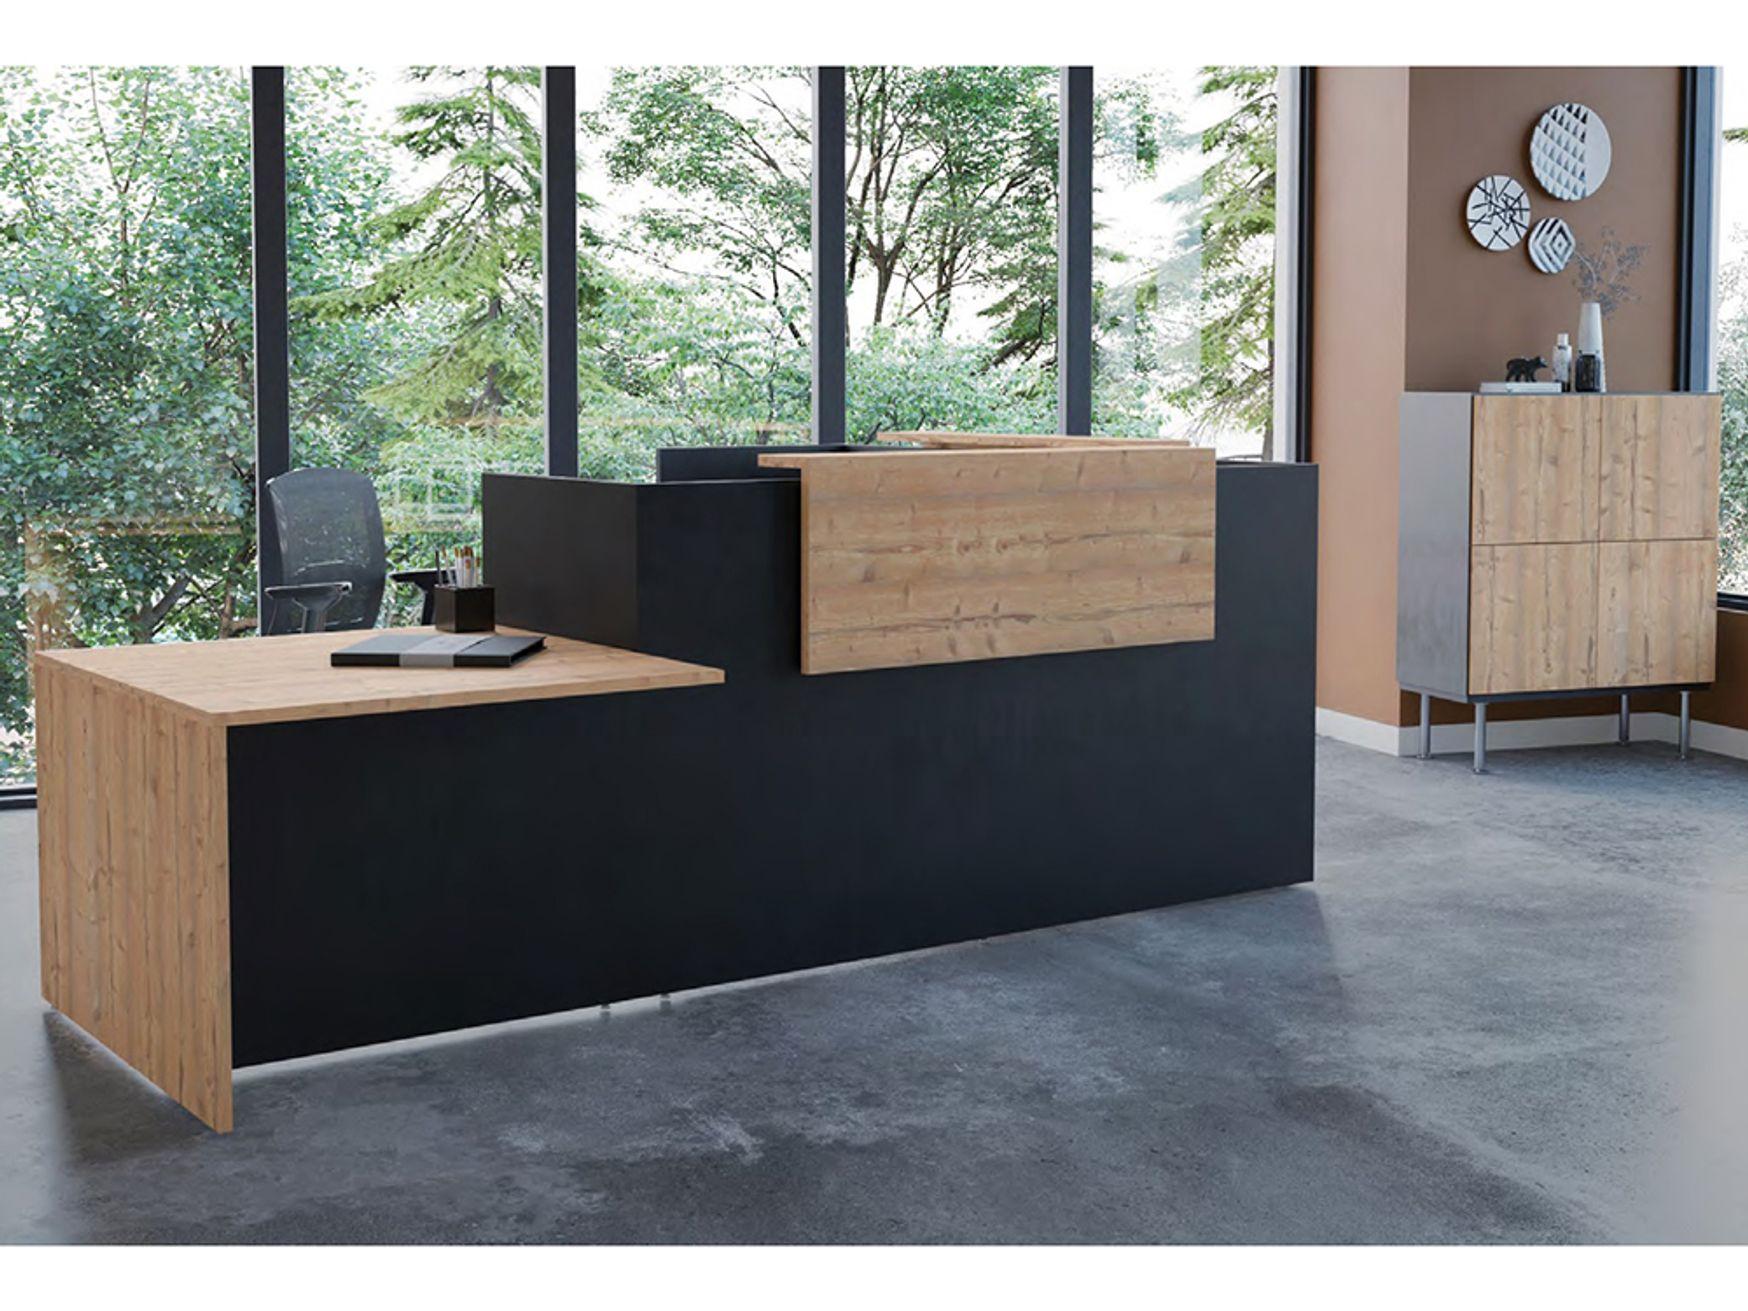 Brand New Modular Reception Desks - Choice of Size, Configuration & Finish